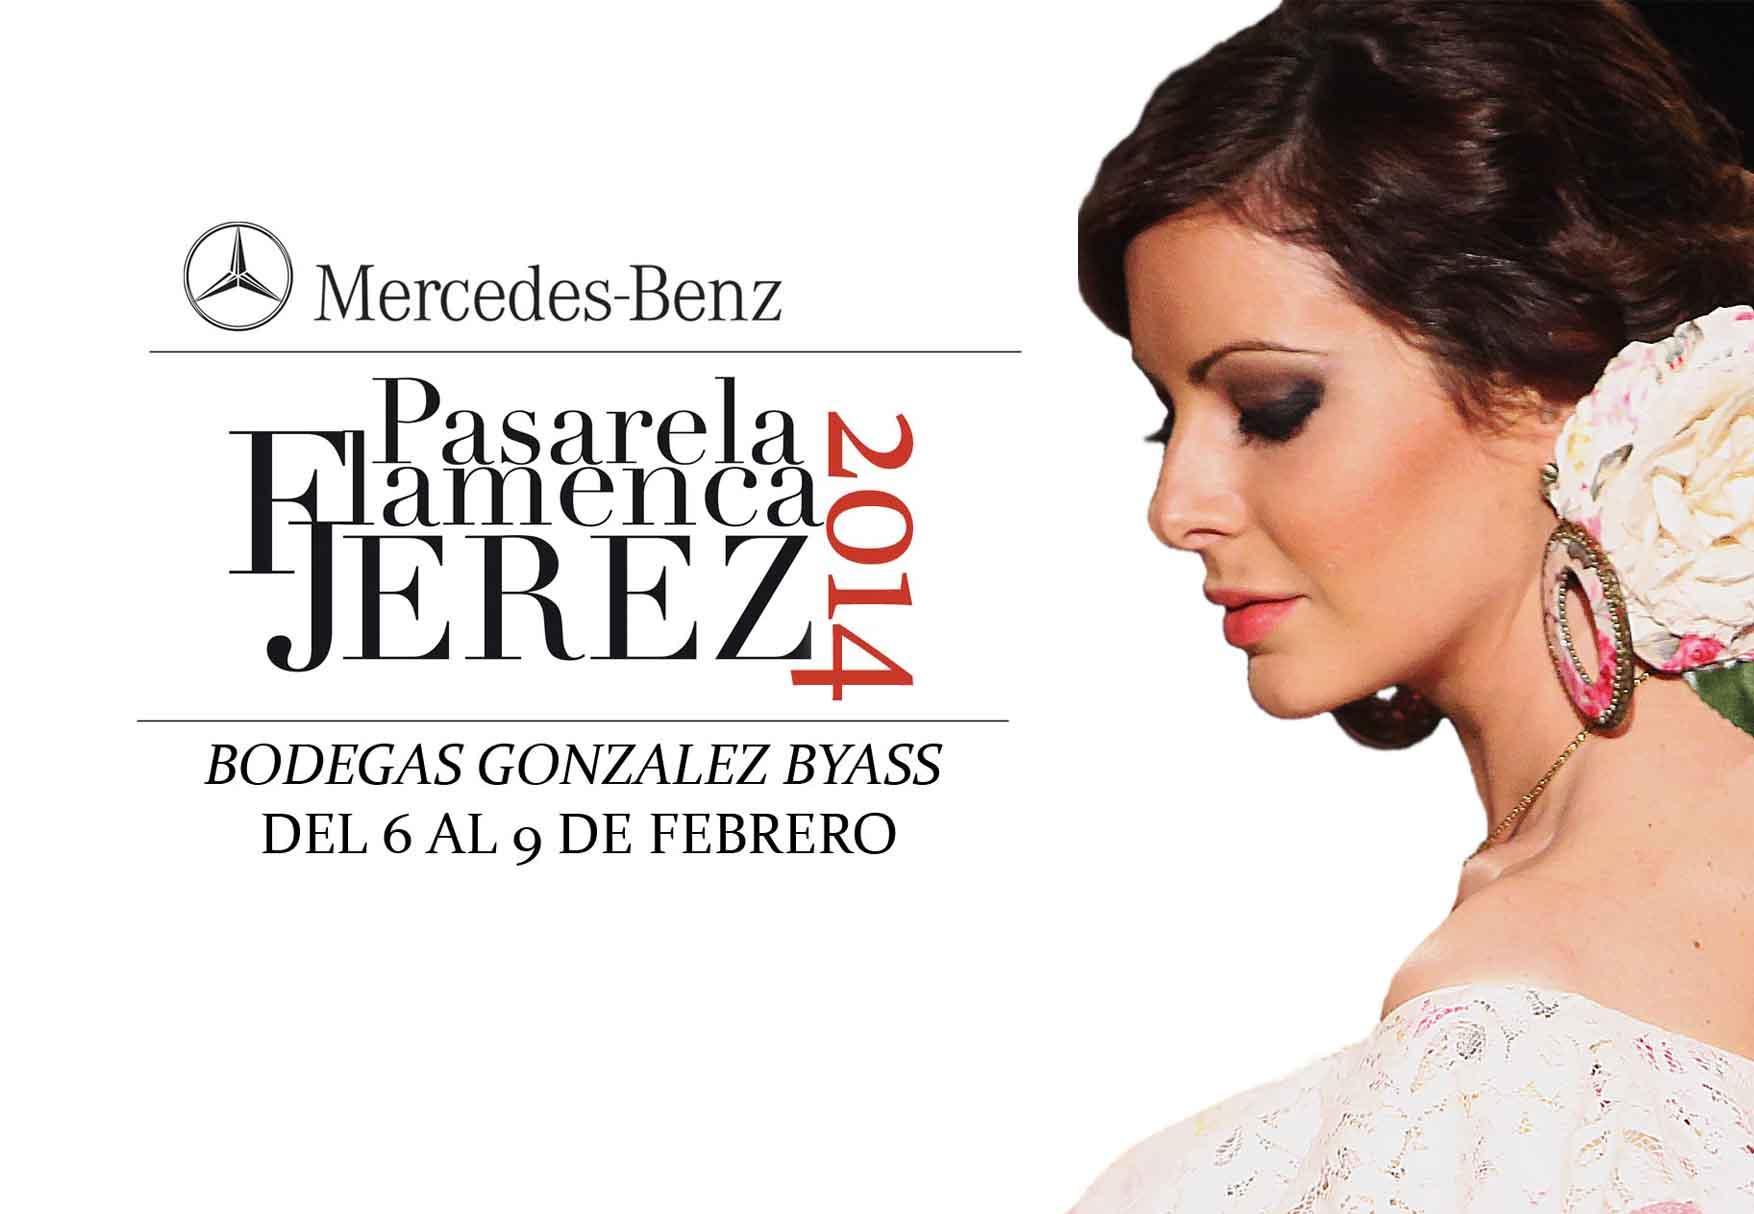 Presentación de la MB Pasarela Flamenca de Jerez 2014